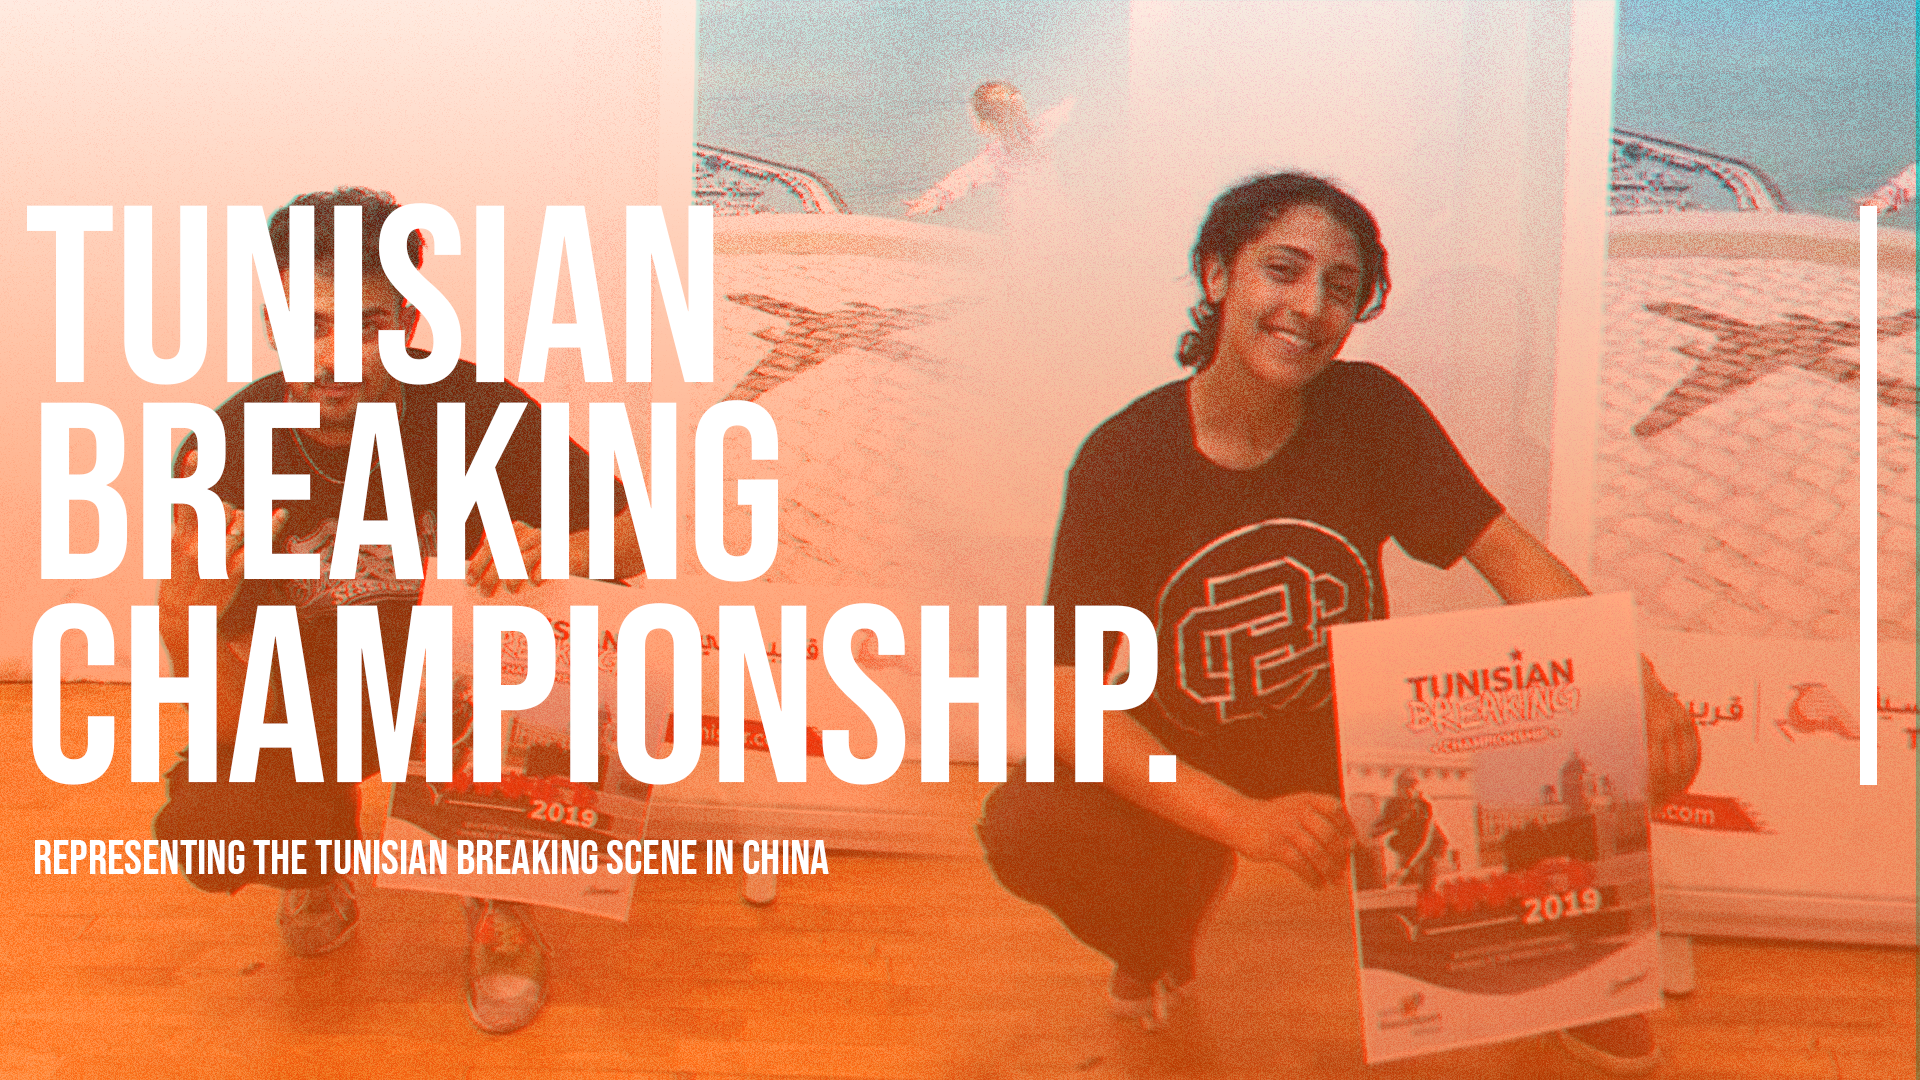 Tunisian Breaking Championship: Representing the Tunisian Breaking Scene inChina